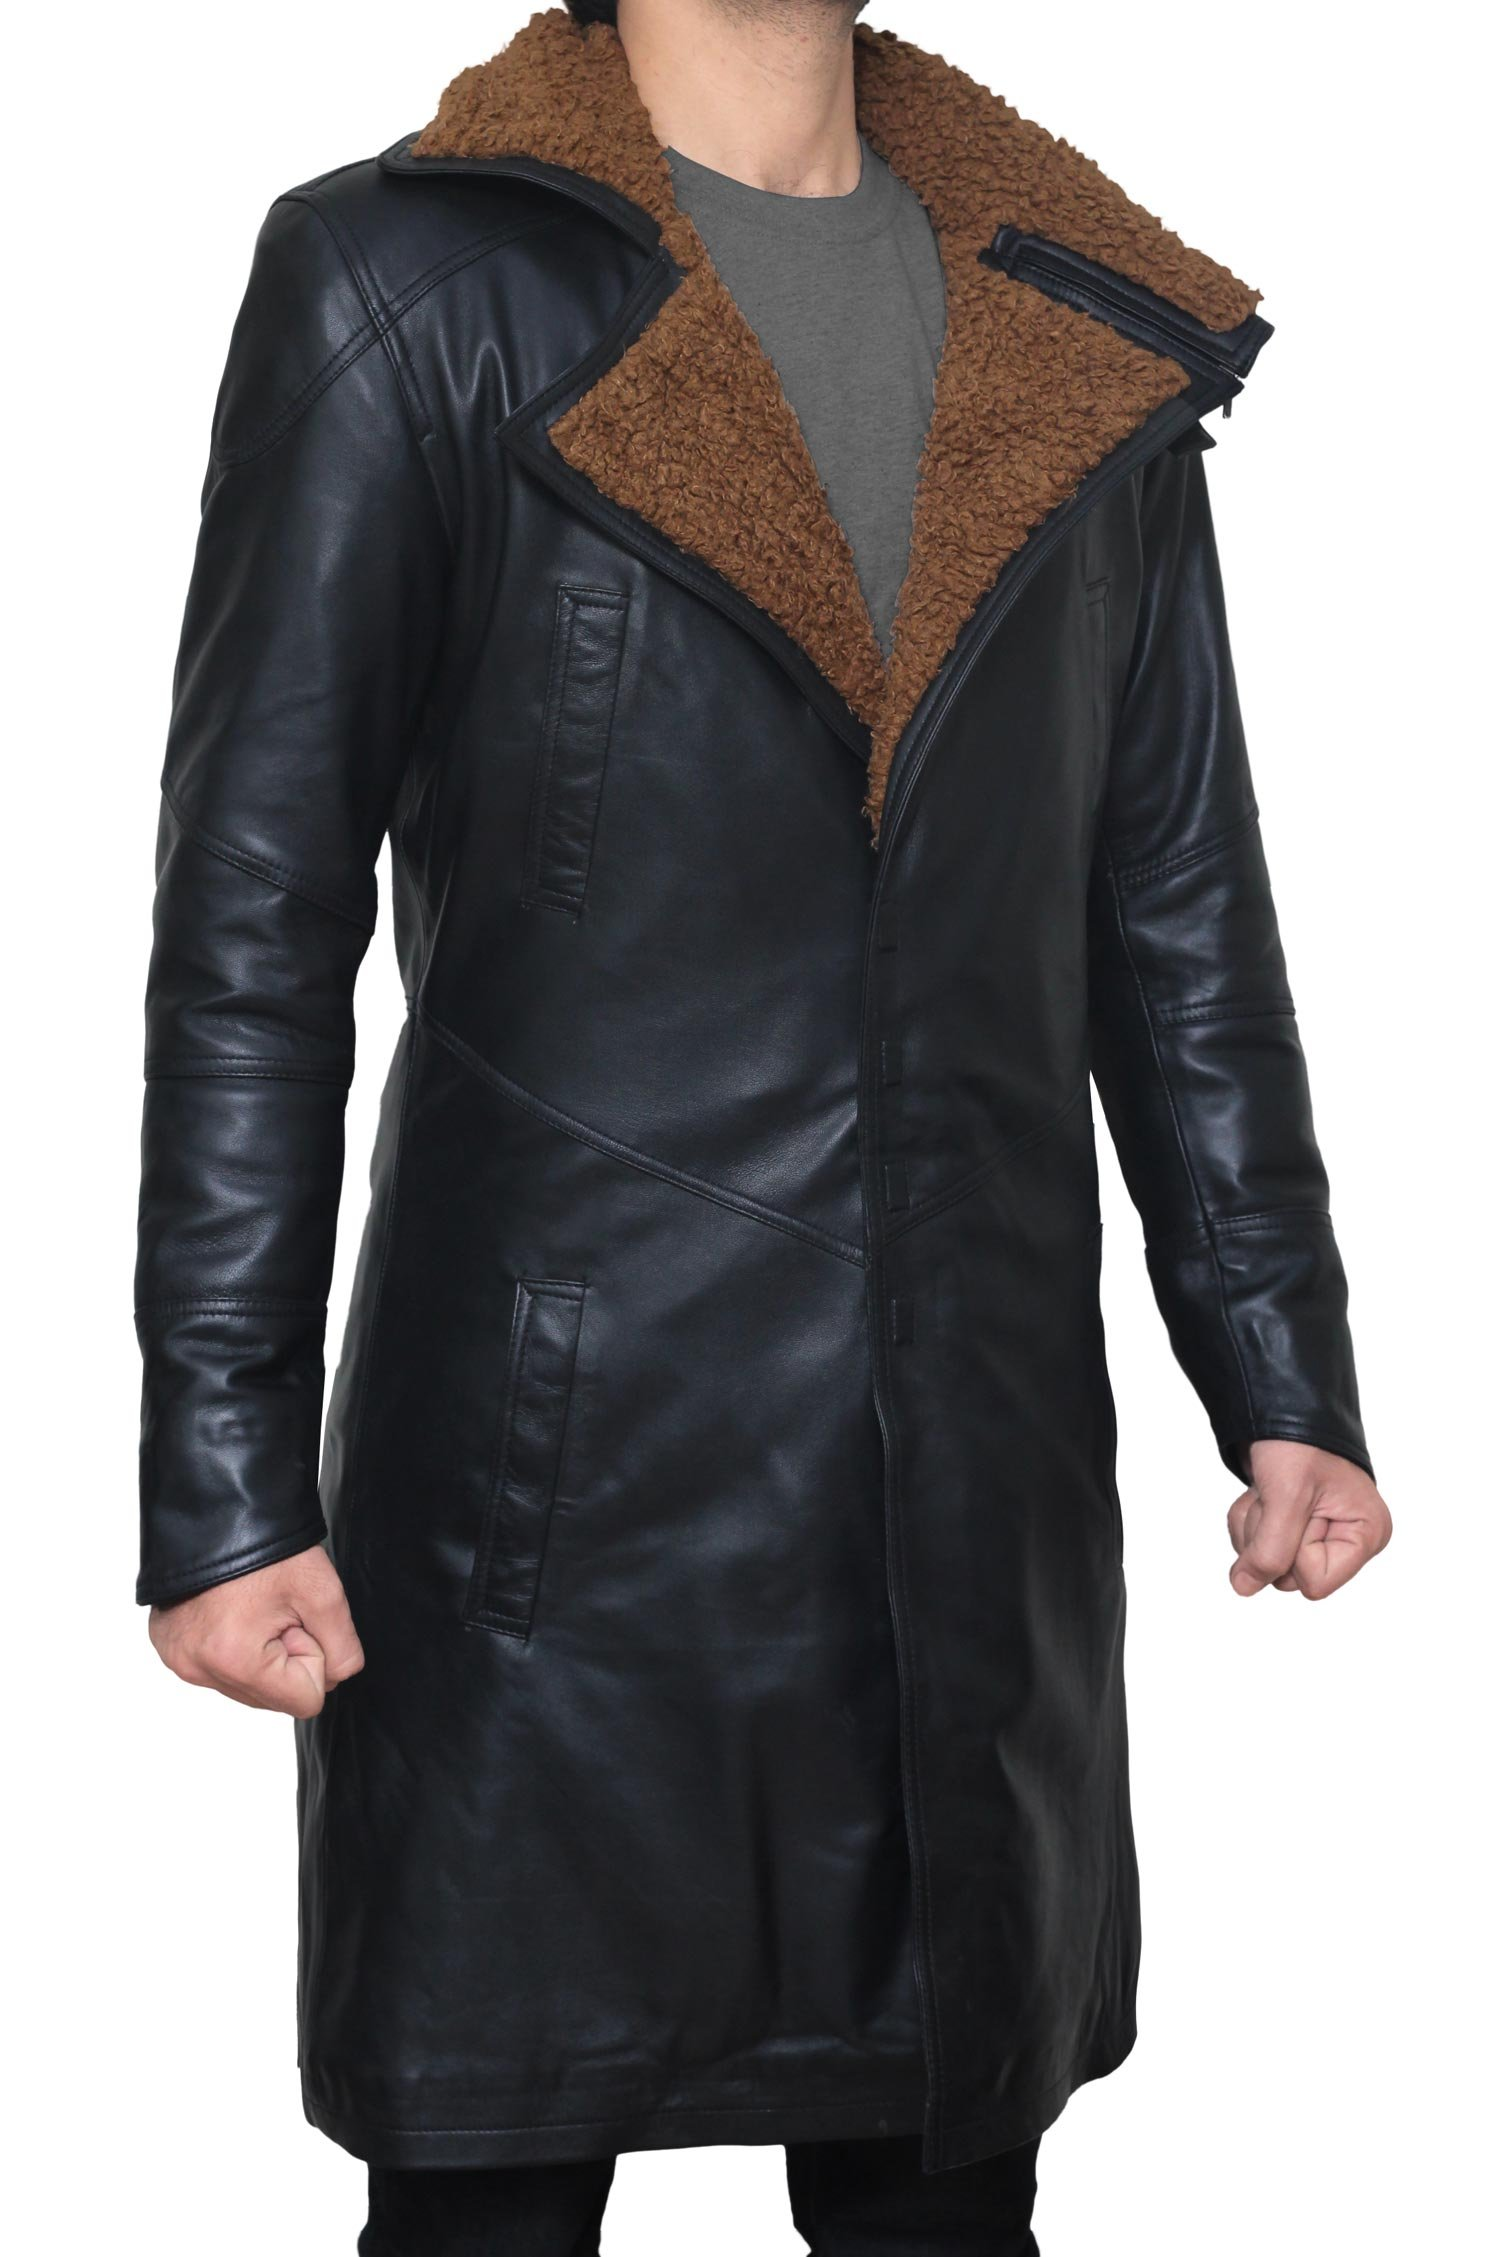 BlingSoul Blade Fur Coat Men Costume - Boys Black Leather Coat (XL) [PU-BLRN-BL-XL] by BlingSoul (Image #2)